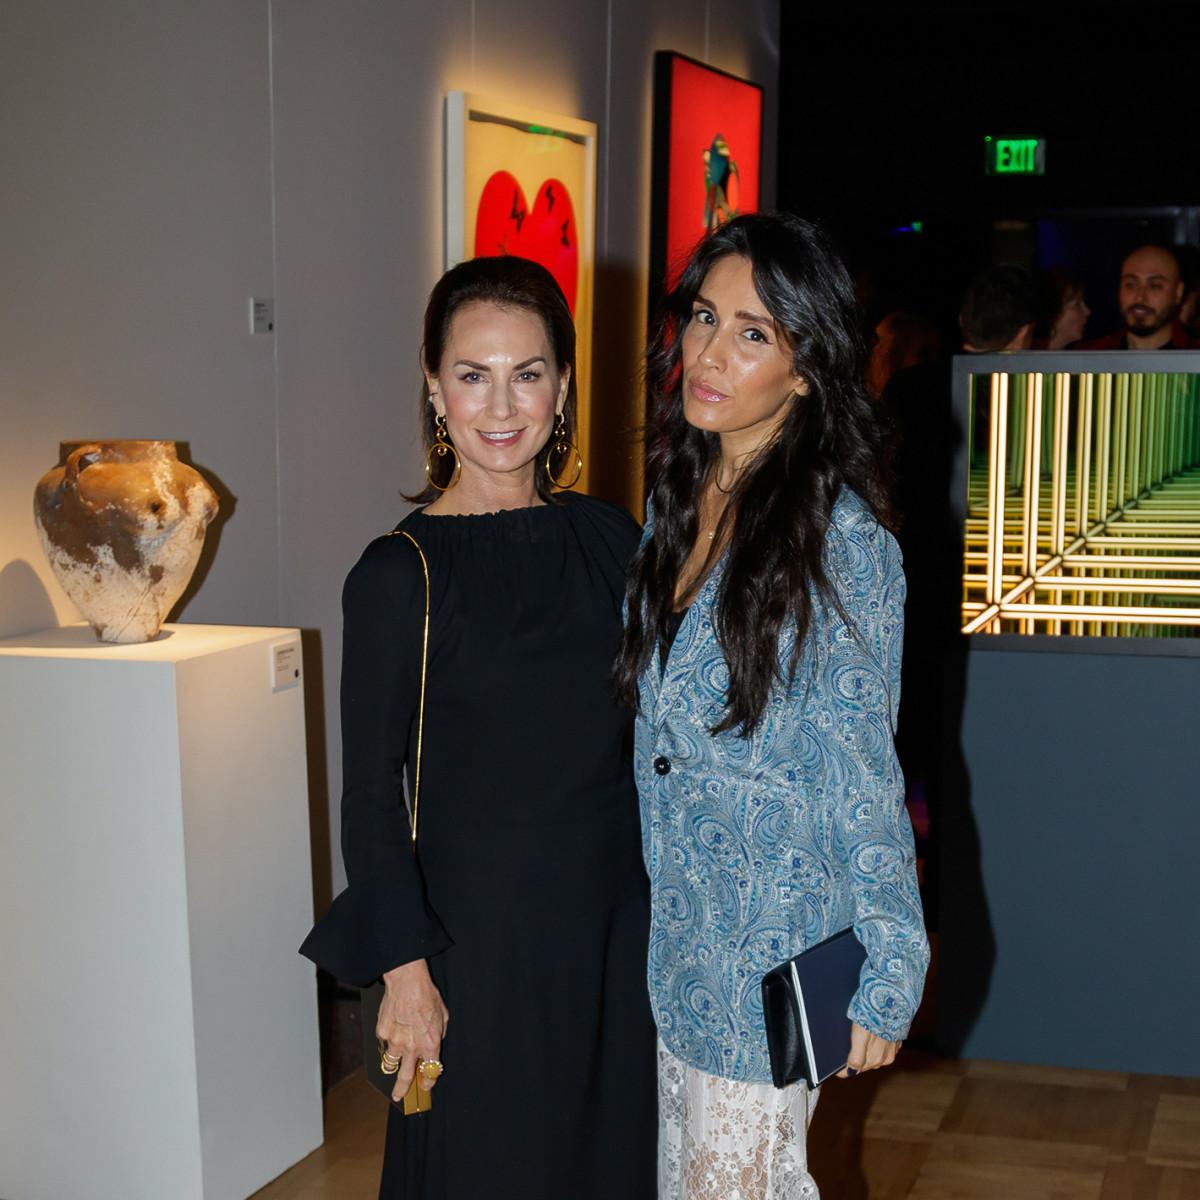 Cheryl Maas, Kristie Ramirez